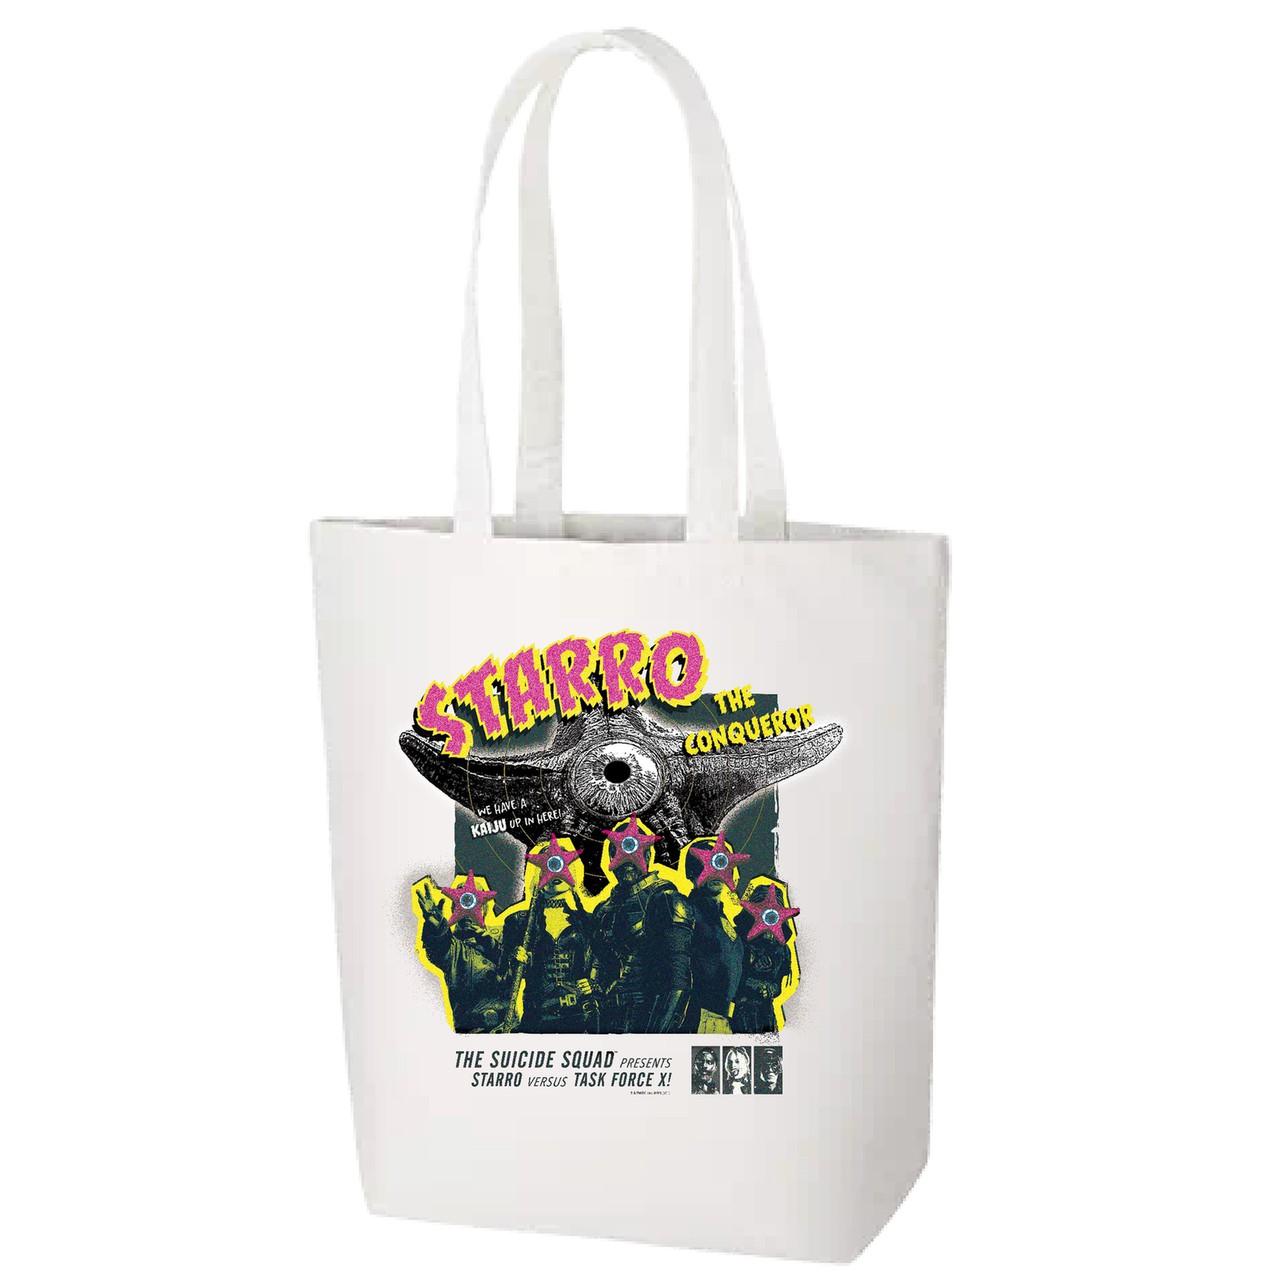 【DCファンドーム限定】トートバッグ/『ザ・スーサイド・スクワッド』